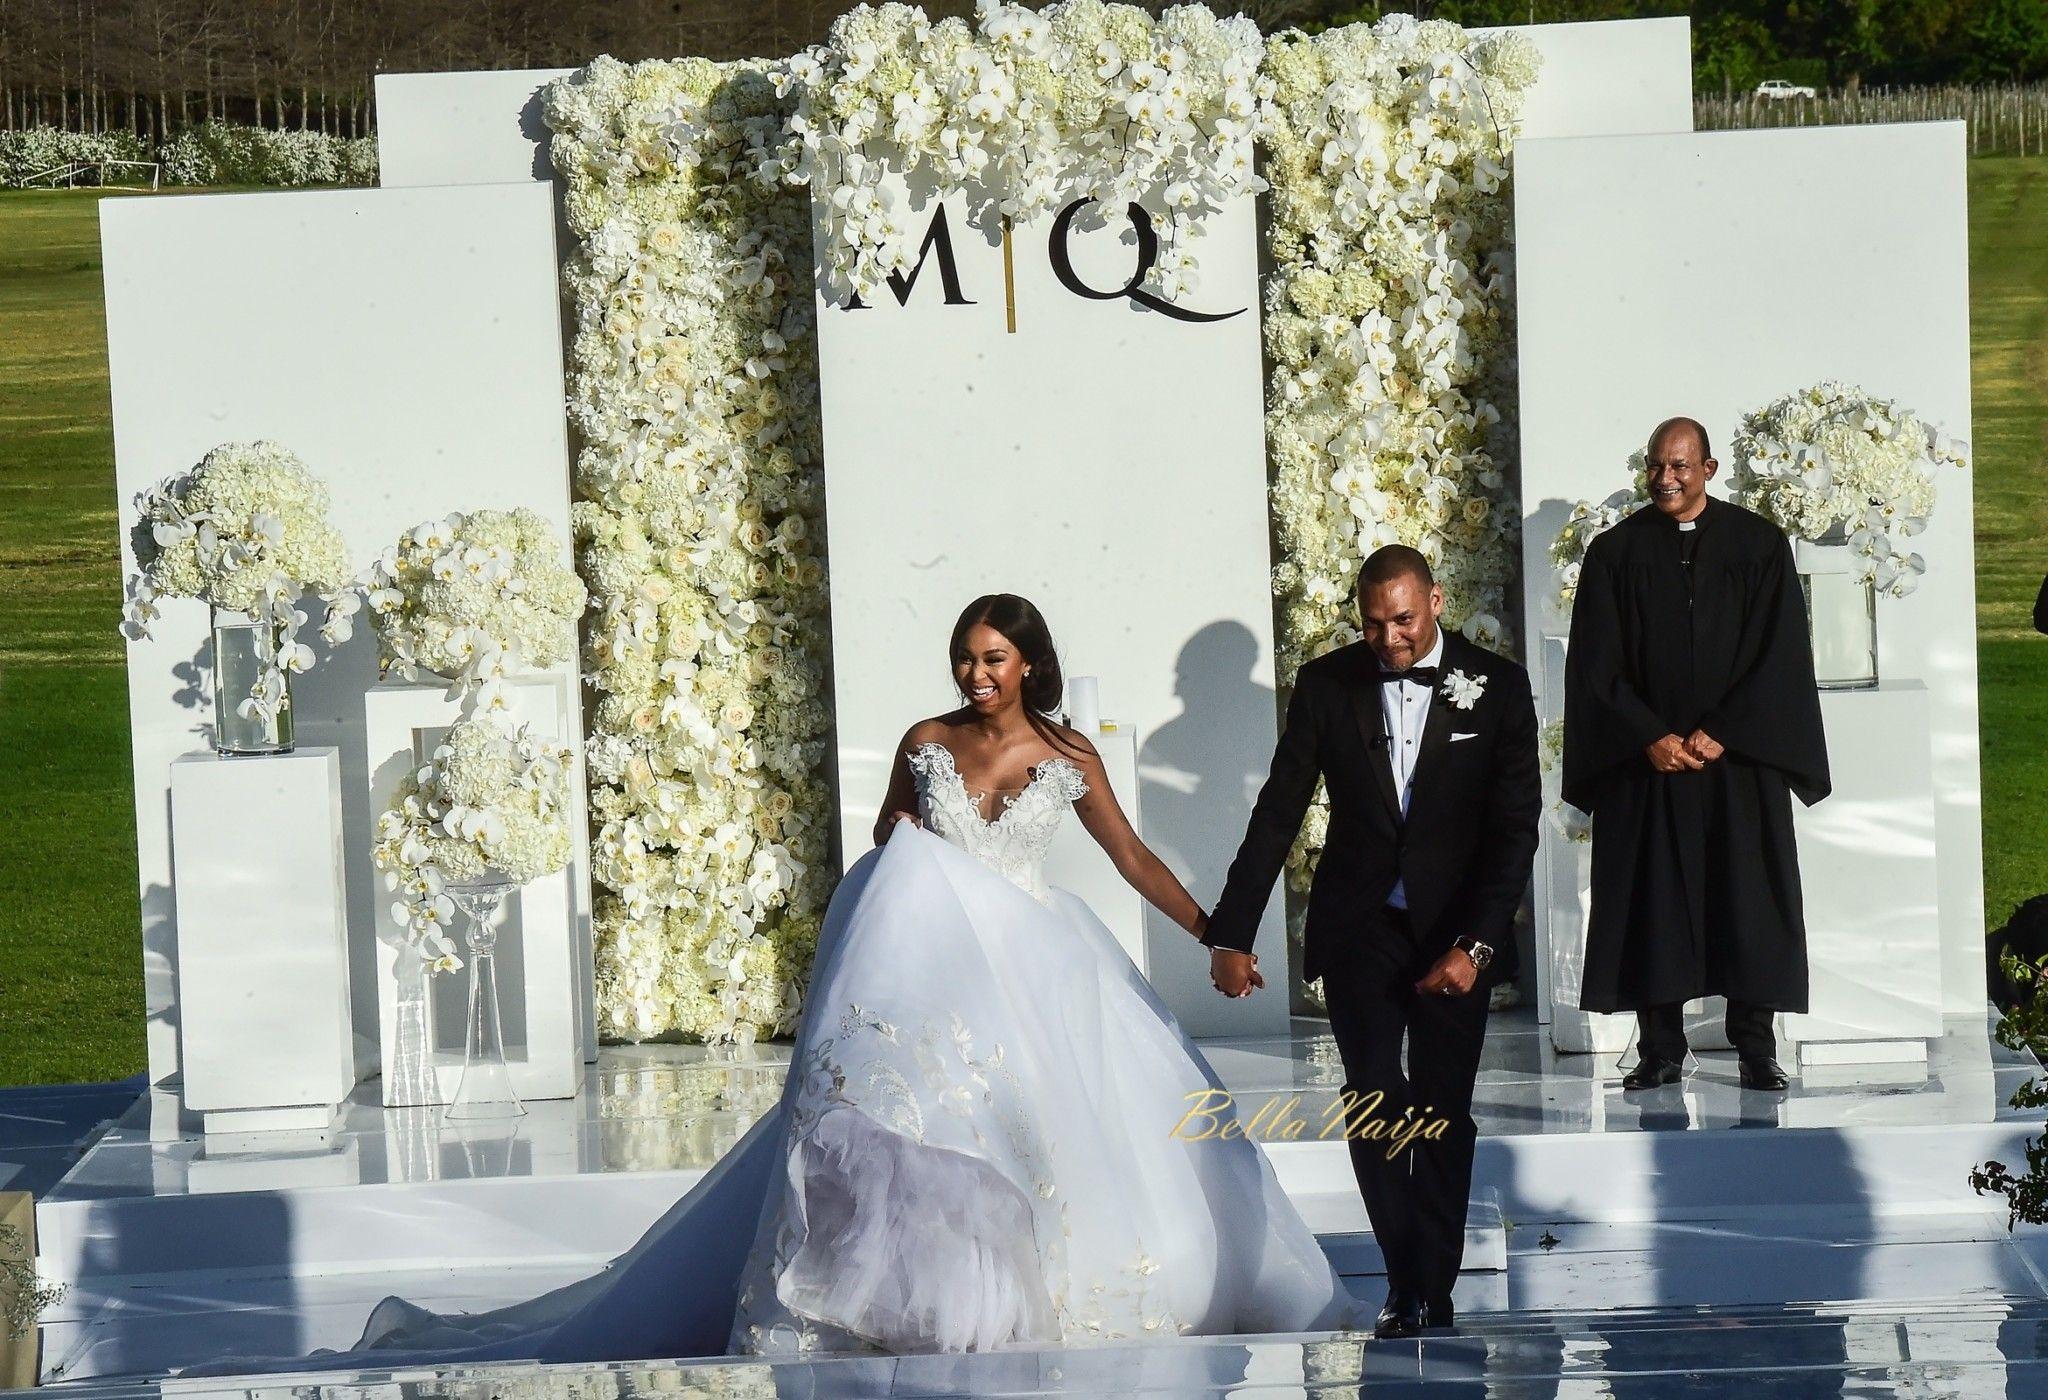 Married minenhle dlamini Minnie Dlamini